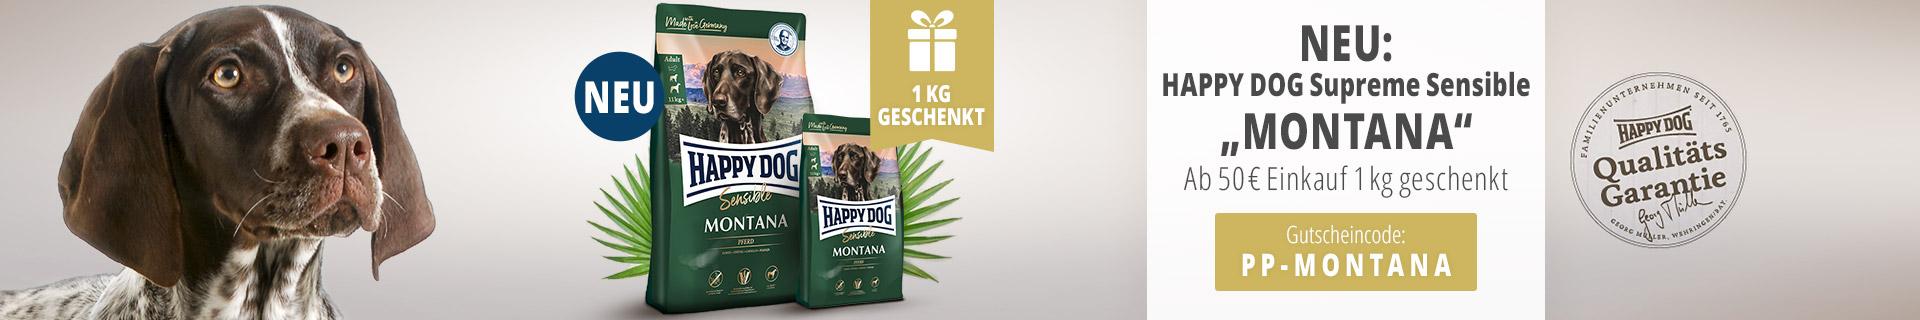 Hapy Dog Aktion Supreme Sensible Montana 1kg gratis ab 50Euro Einkauf